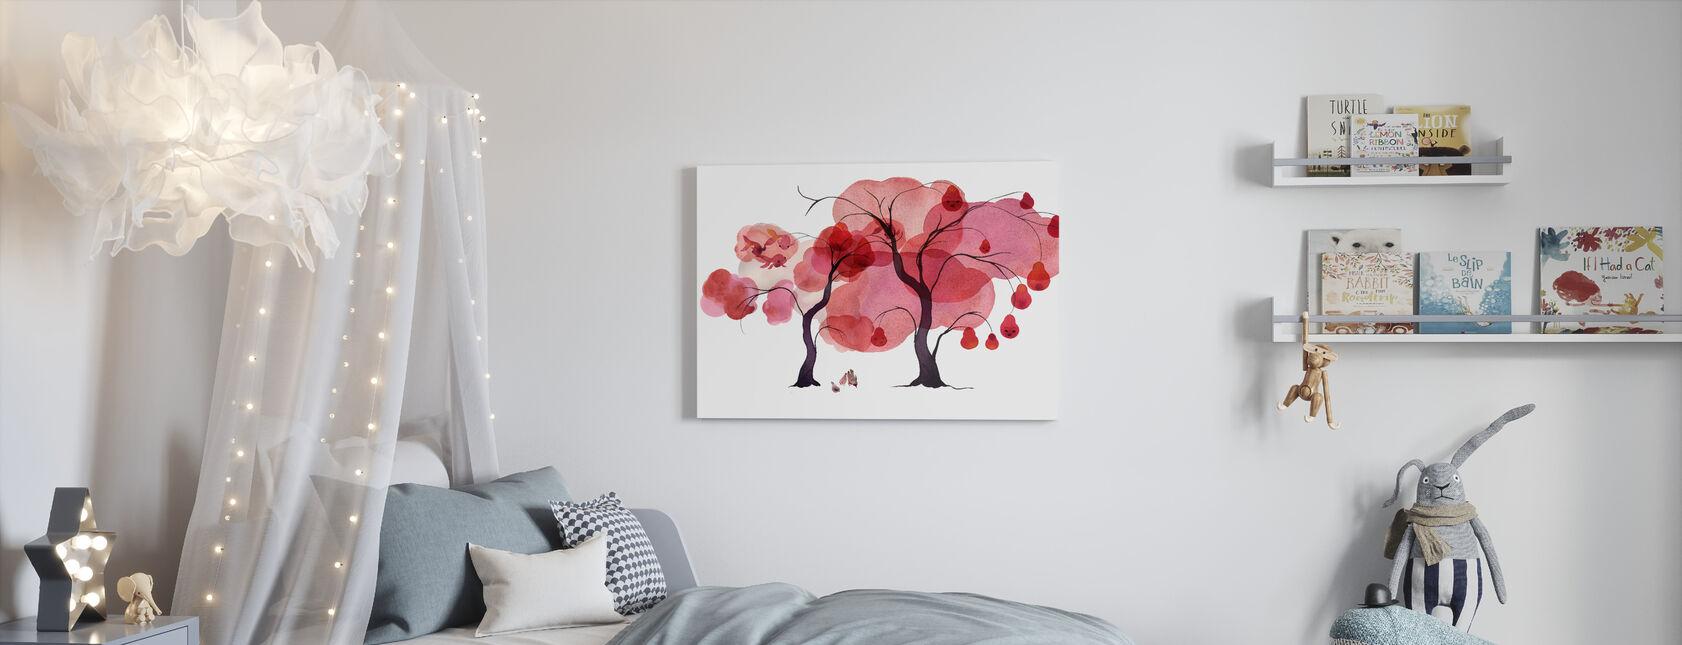 Water Color Trees III - Canvas print - Kids Room